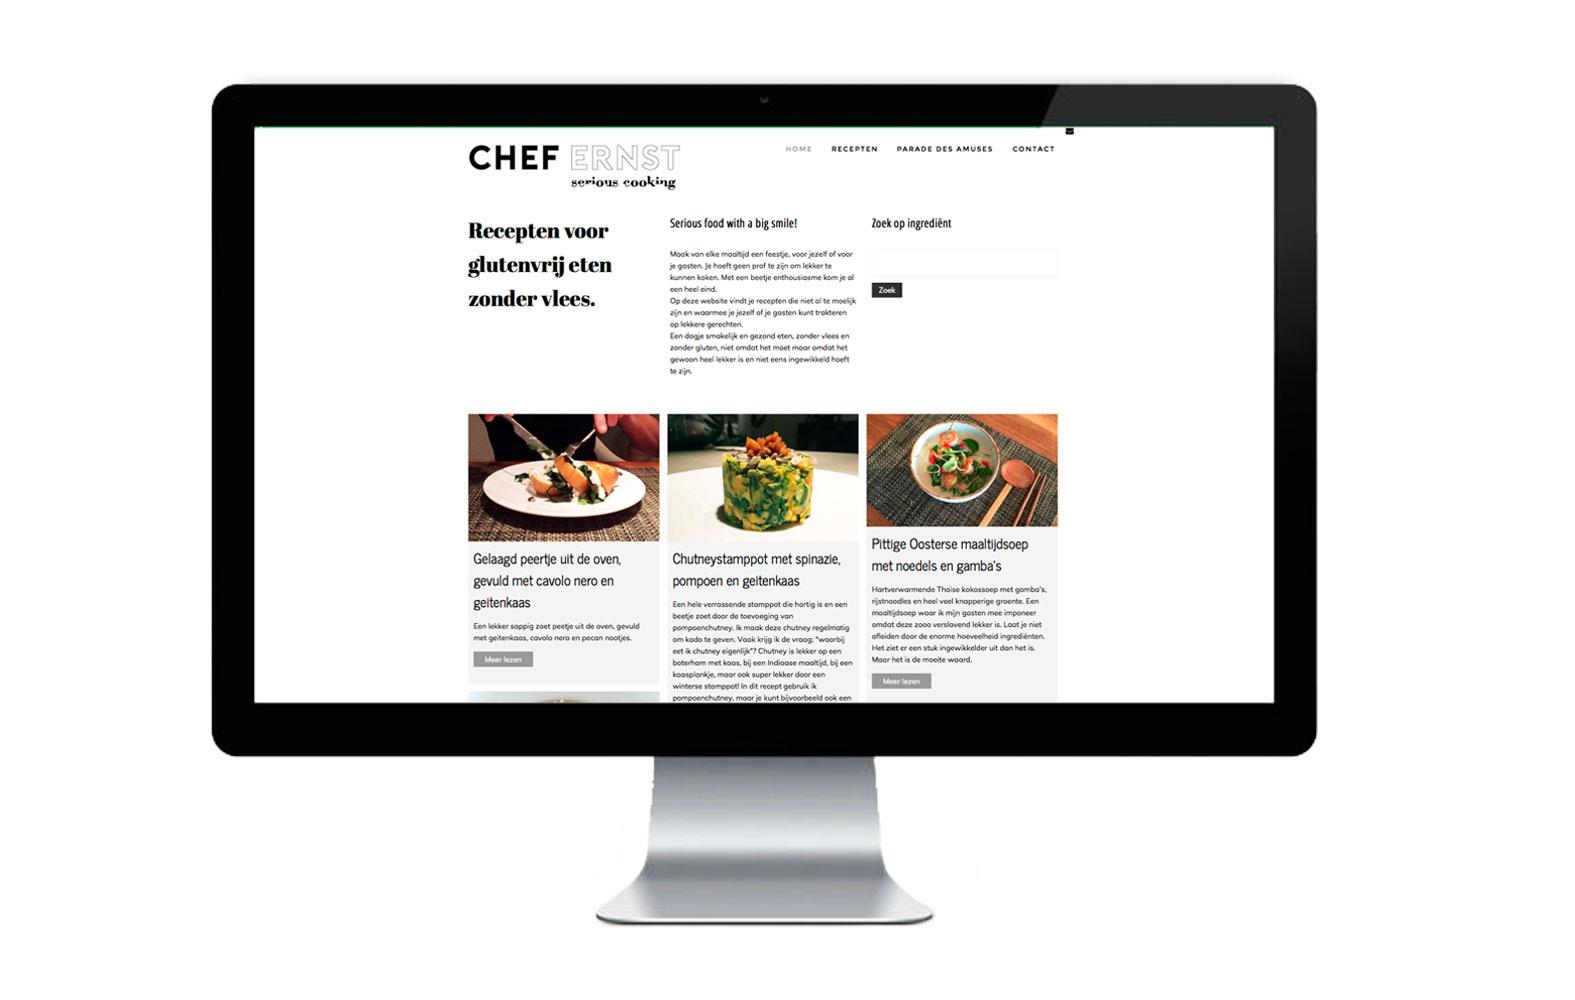 Chef-Ernst-serious-cooking-website-home2-Studio-Ernst